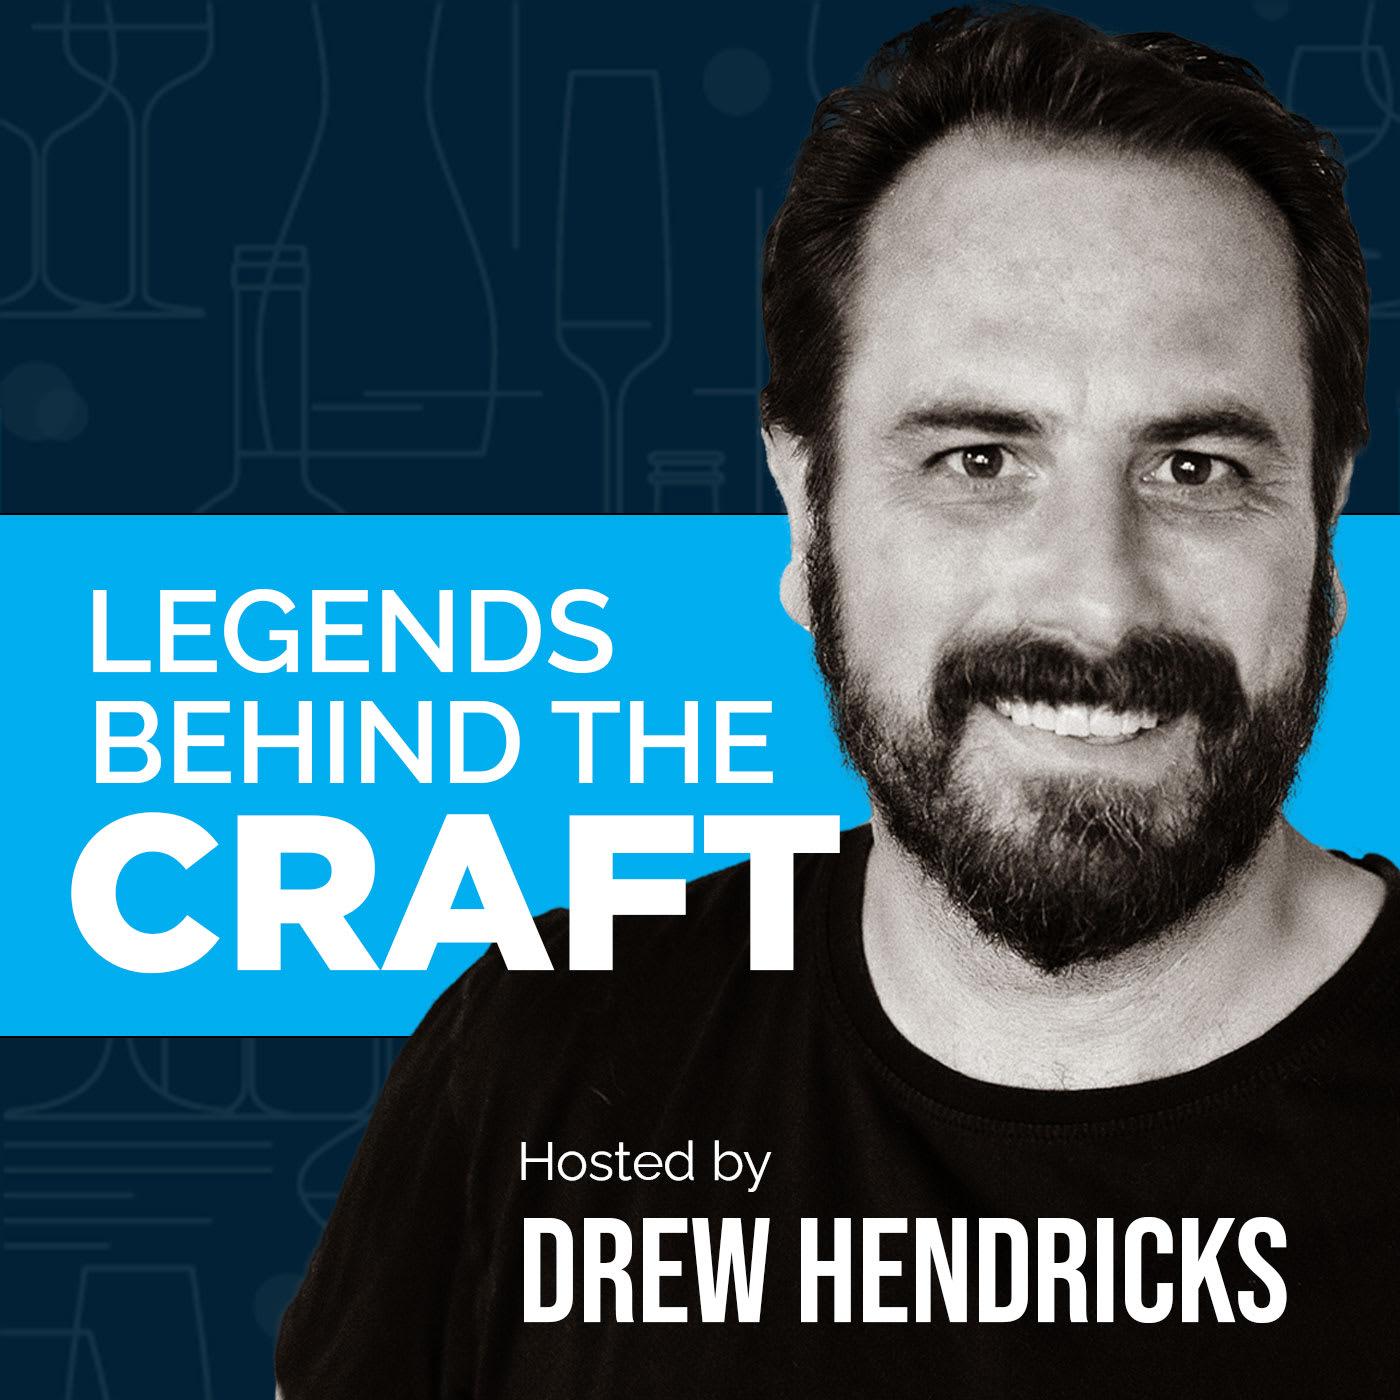 Drew Hendricks - Legends Behinds the Craft